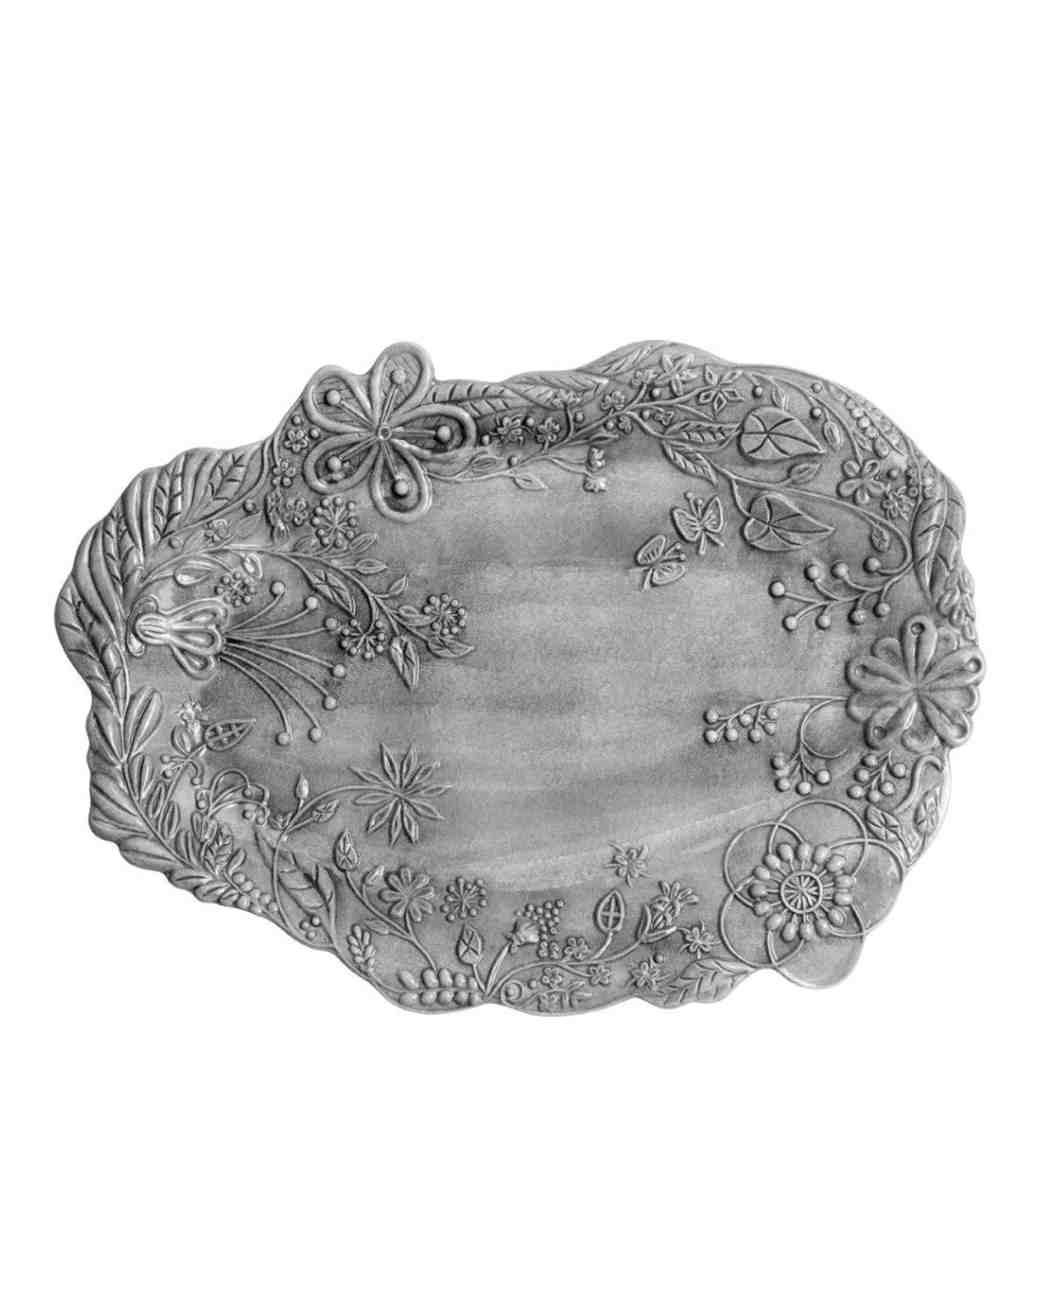 china-registry-essentials-mateus-tord-boontje-grey-lake-platter-1014.jpg